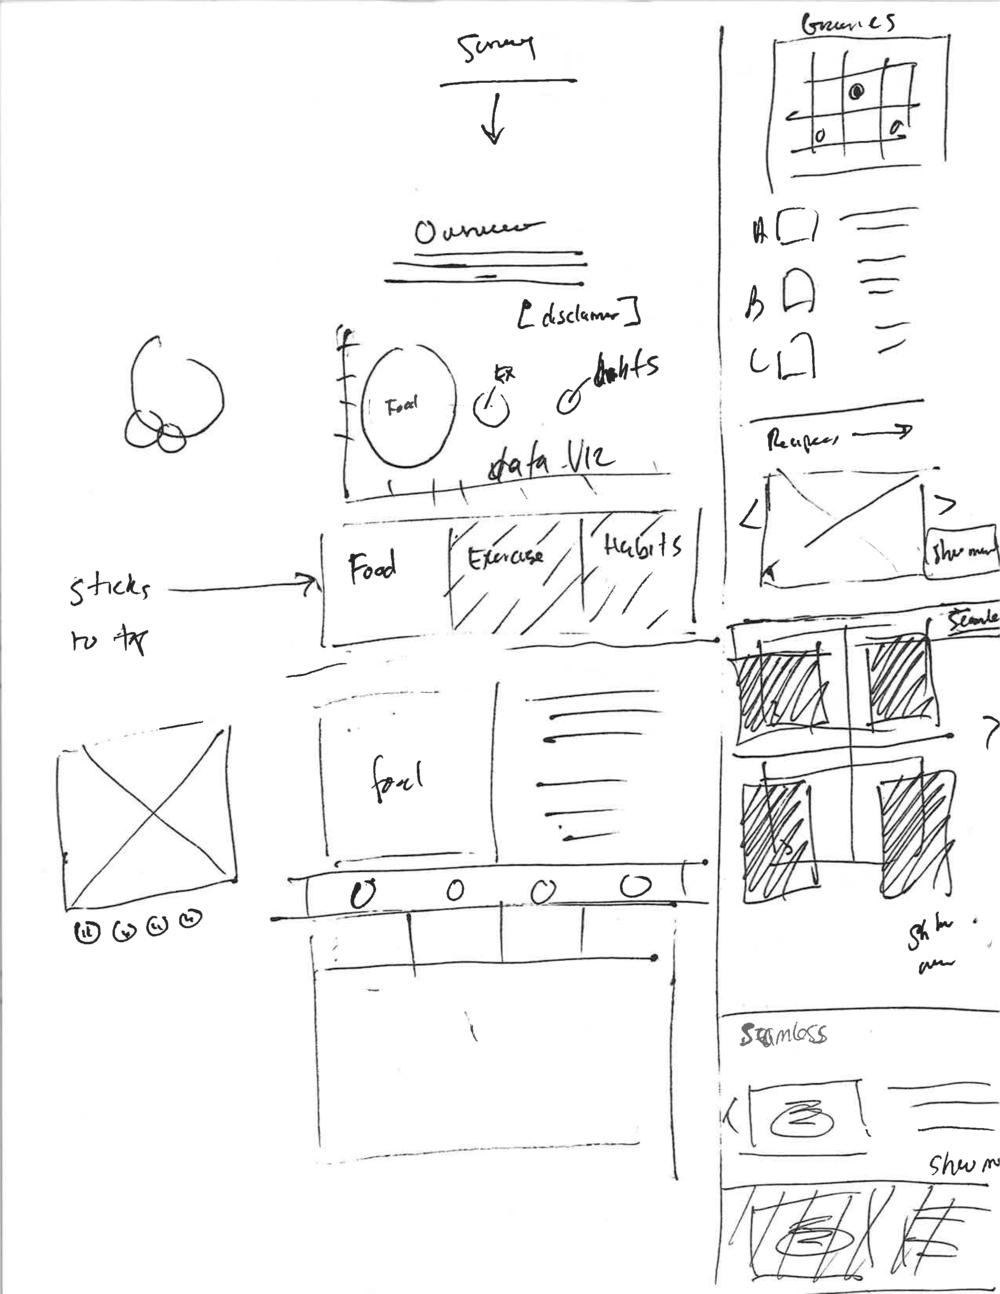 responsive-design-01.png